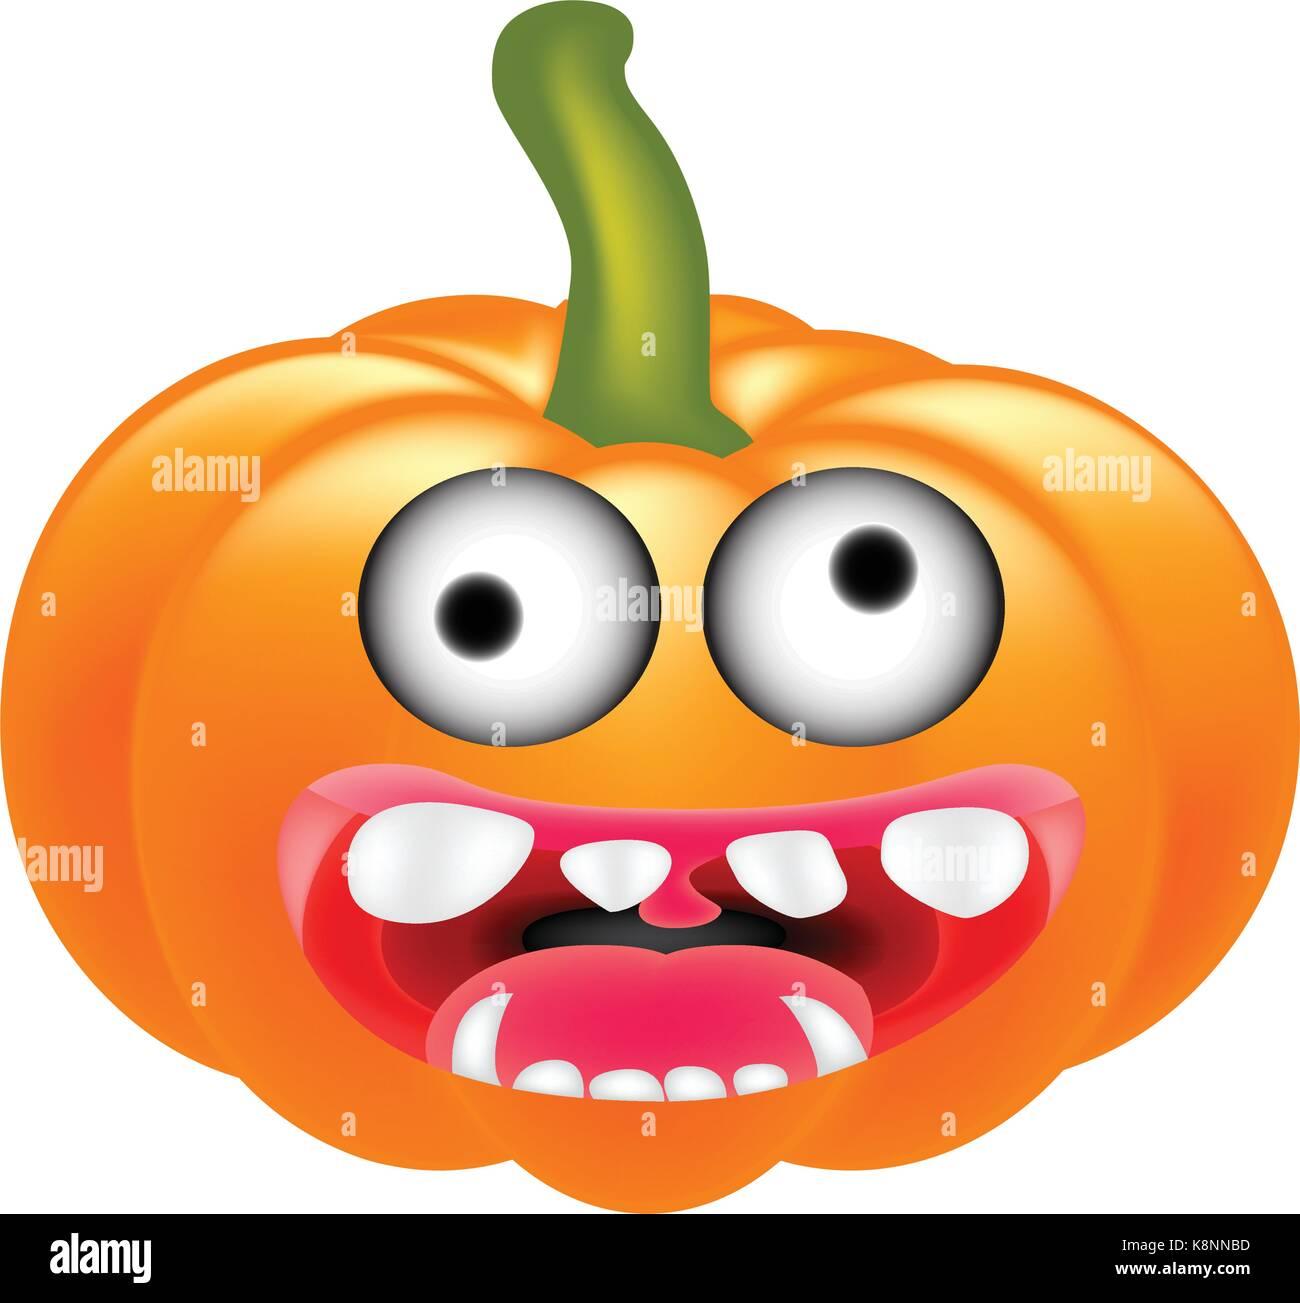 Halloween Pumpkin Cartoon Images.Crazy Halloween Pumpkin Cartoon Character With Eyes And